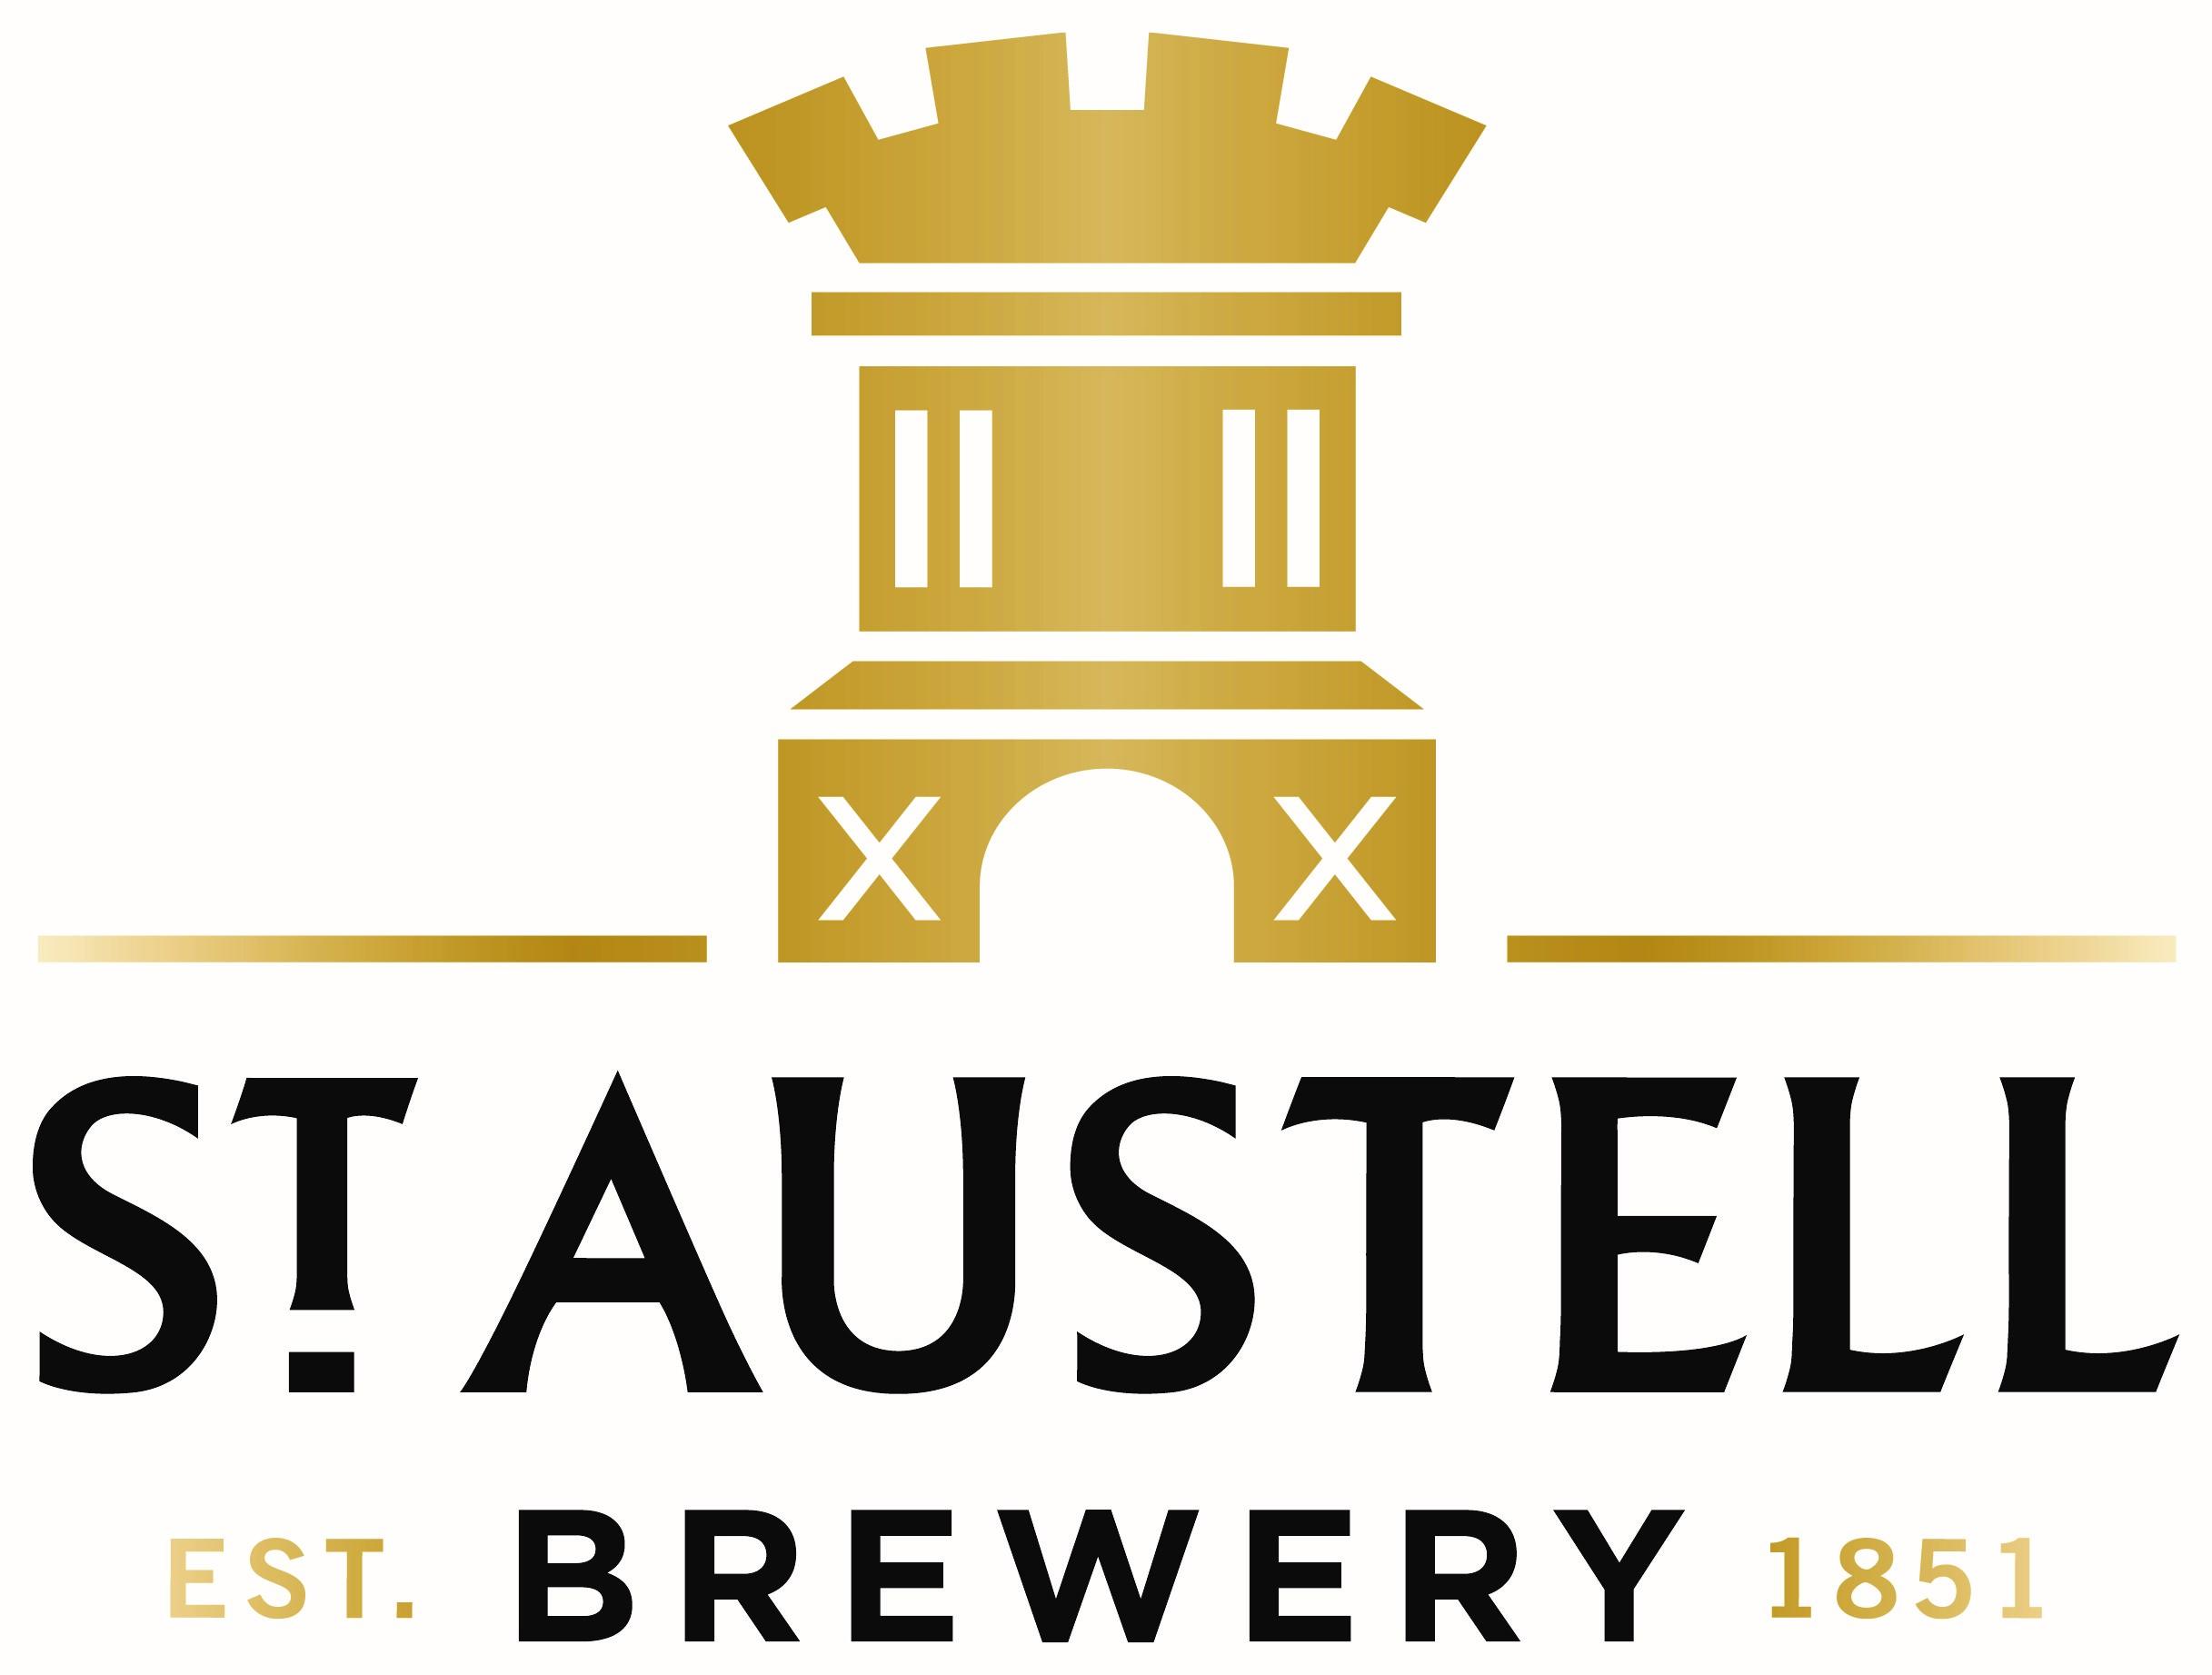 St Aust brewery logo.jpg